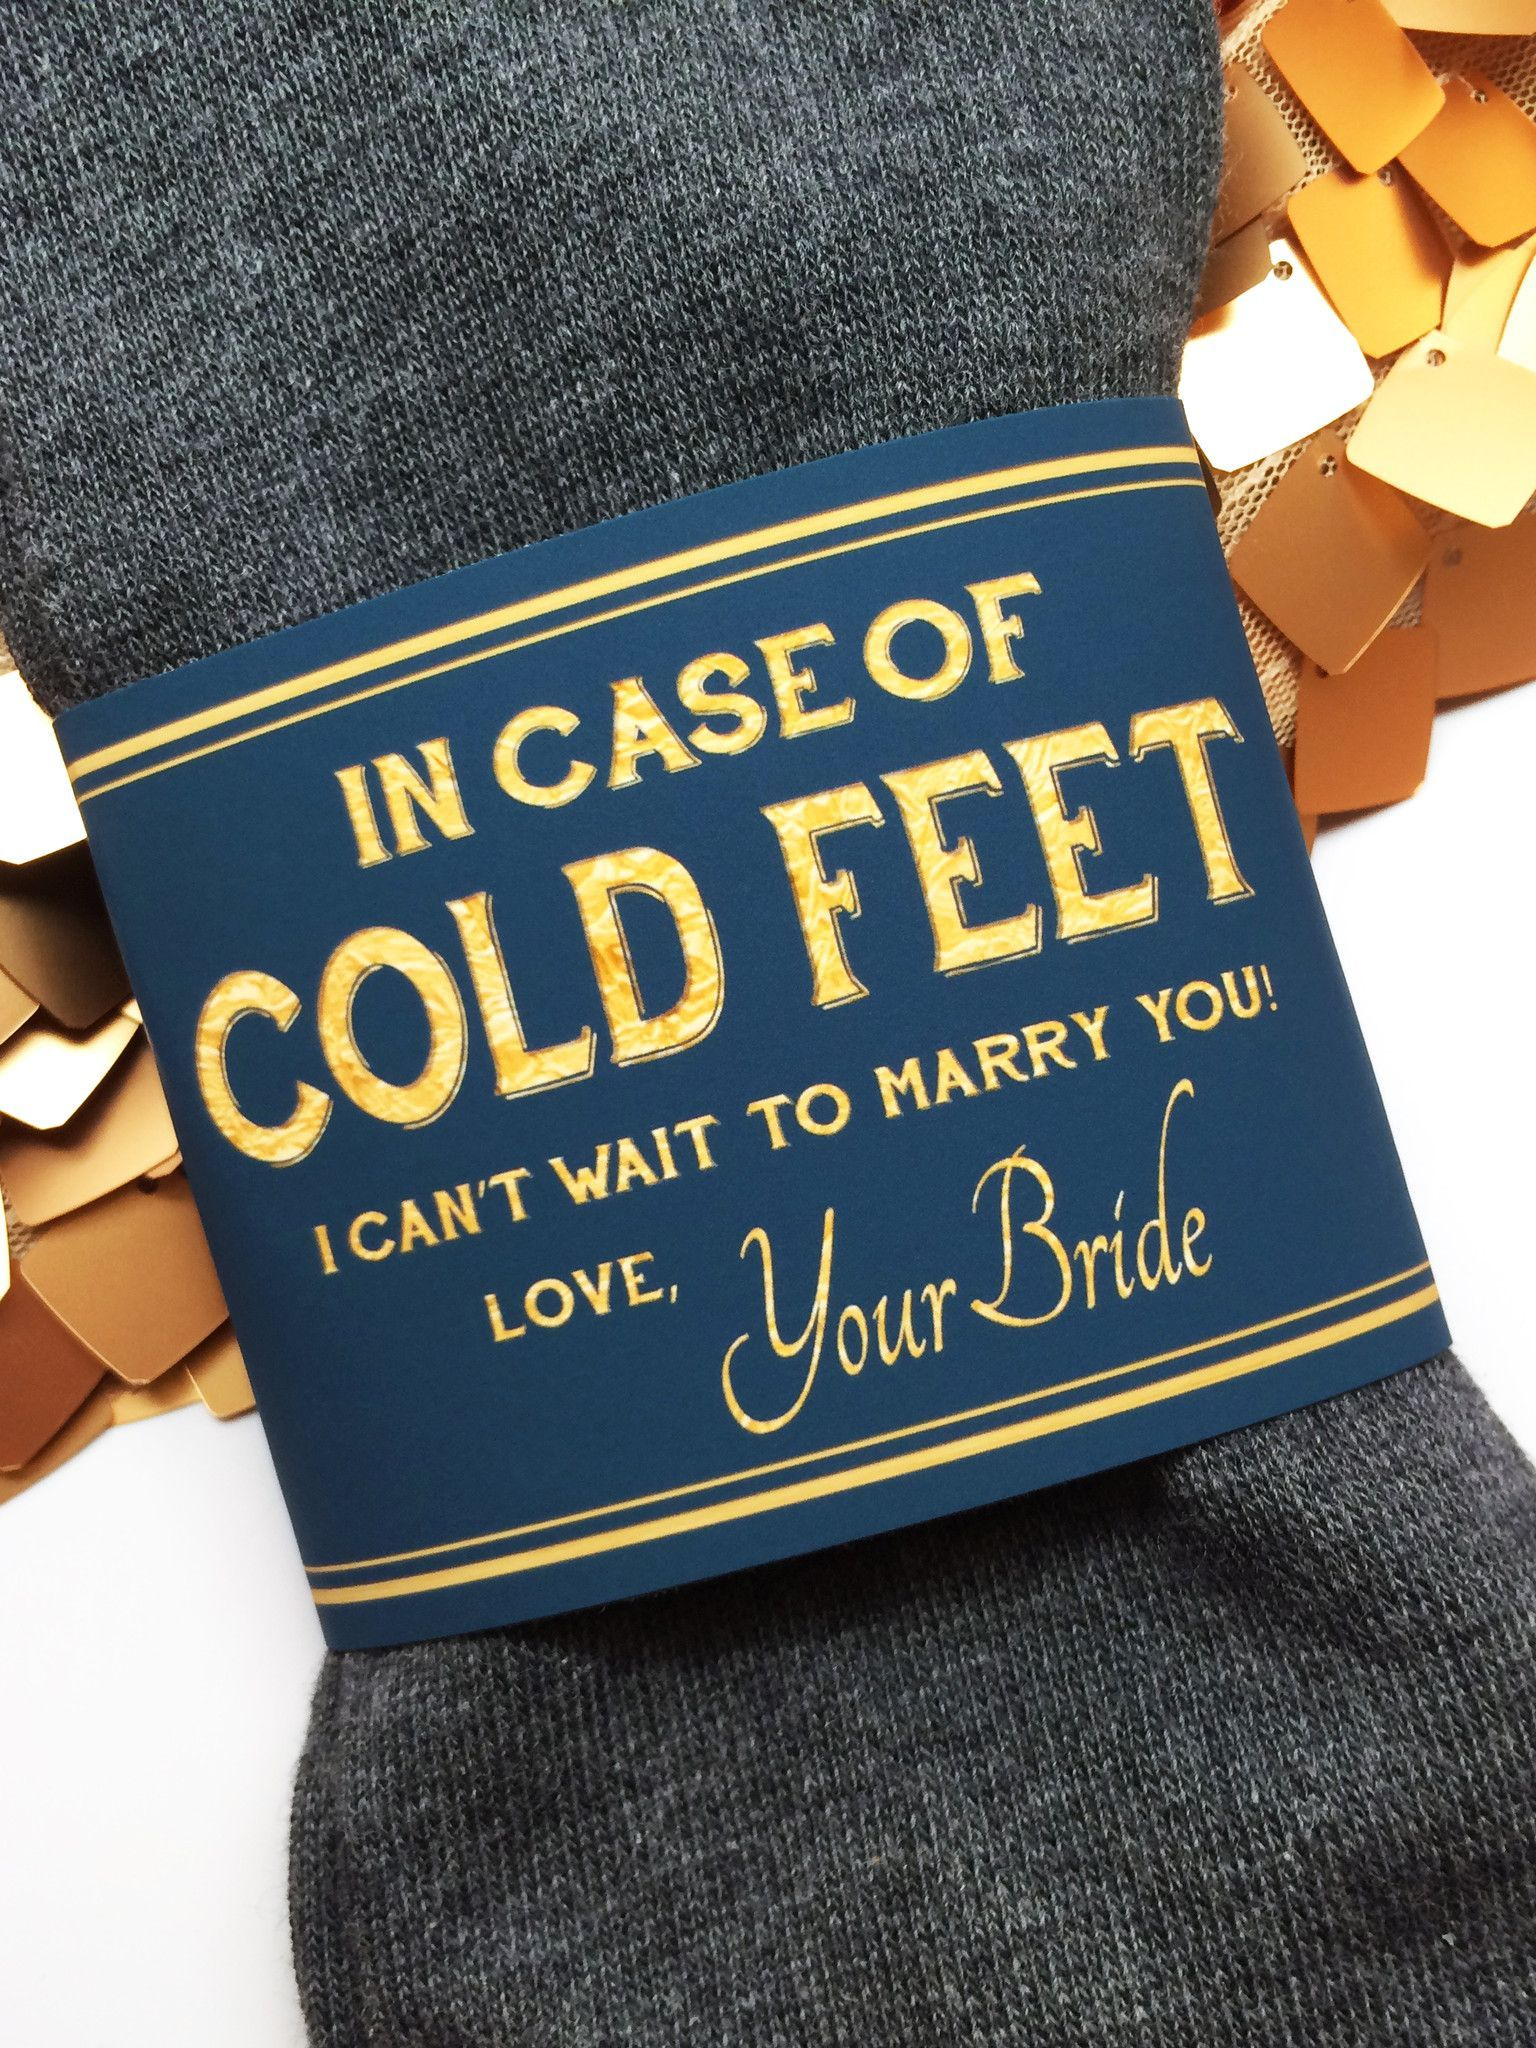 Groom cold feet before wedding